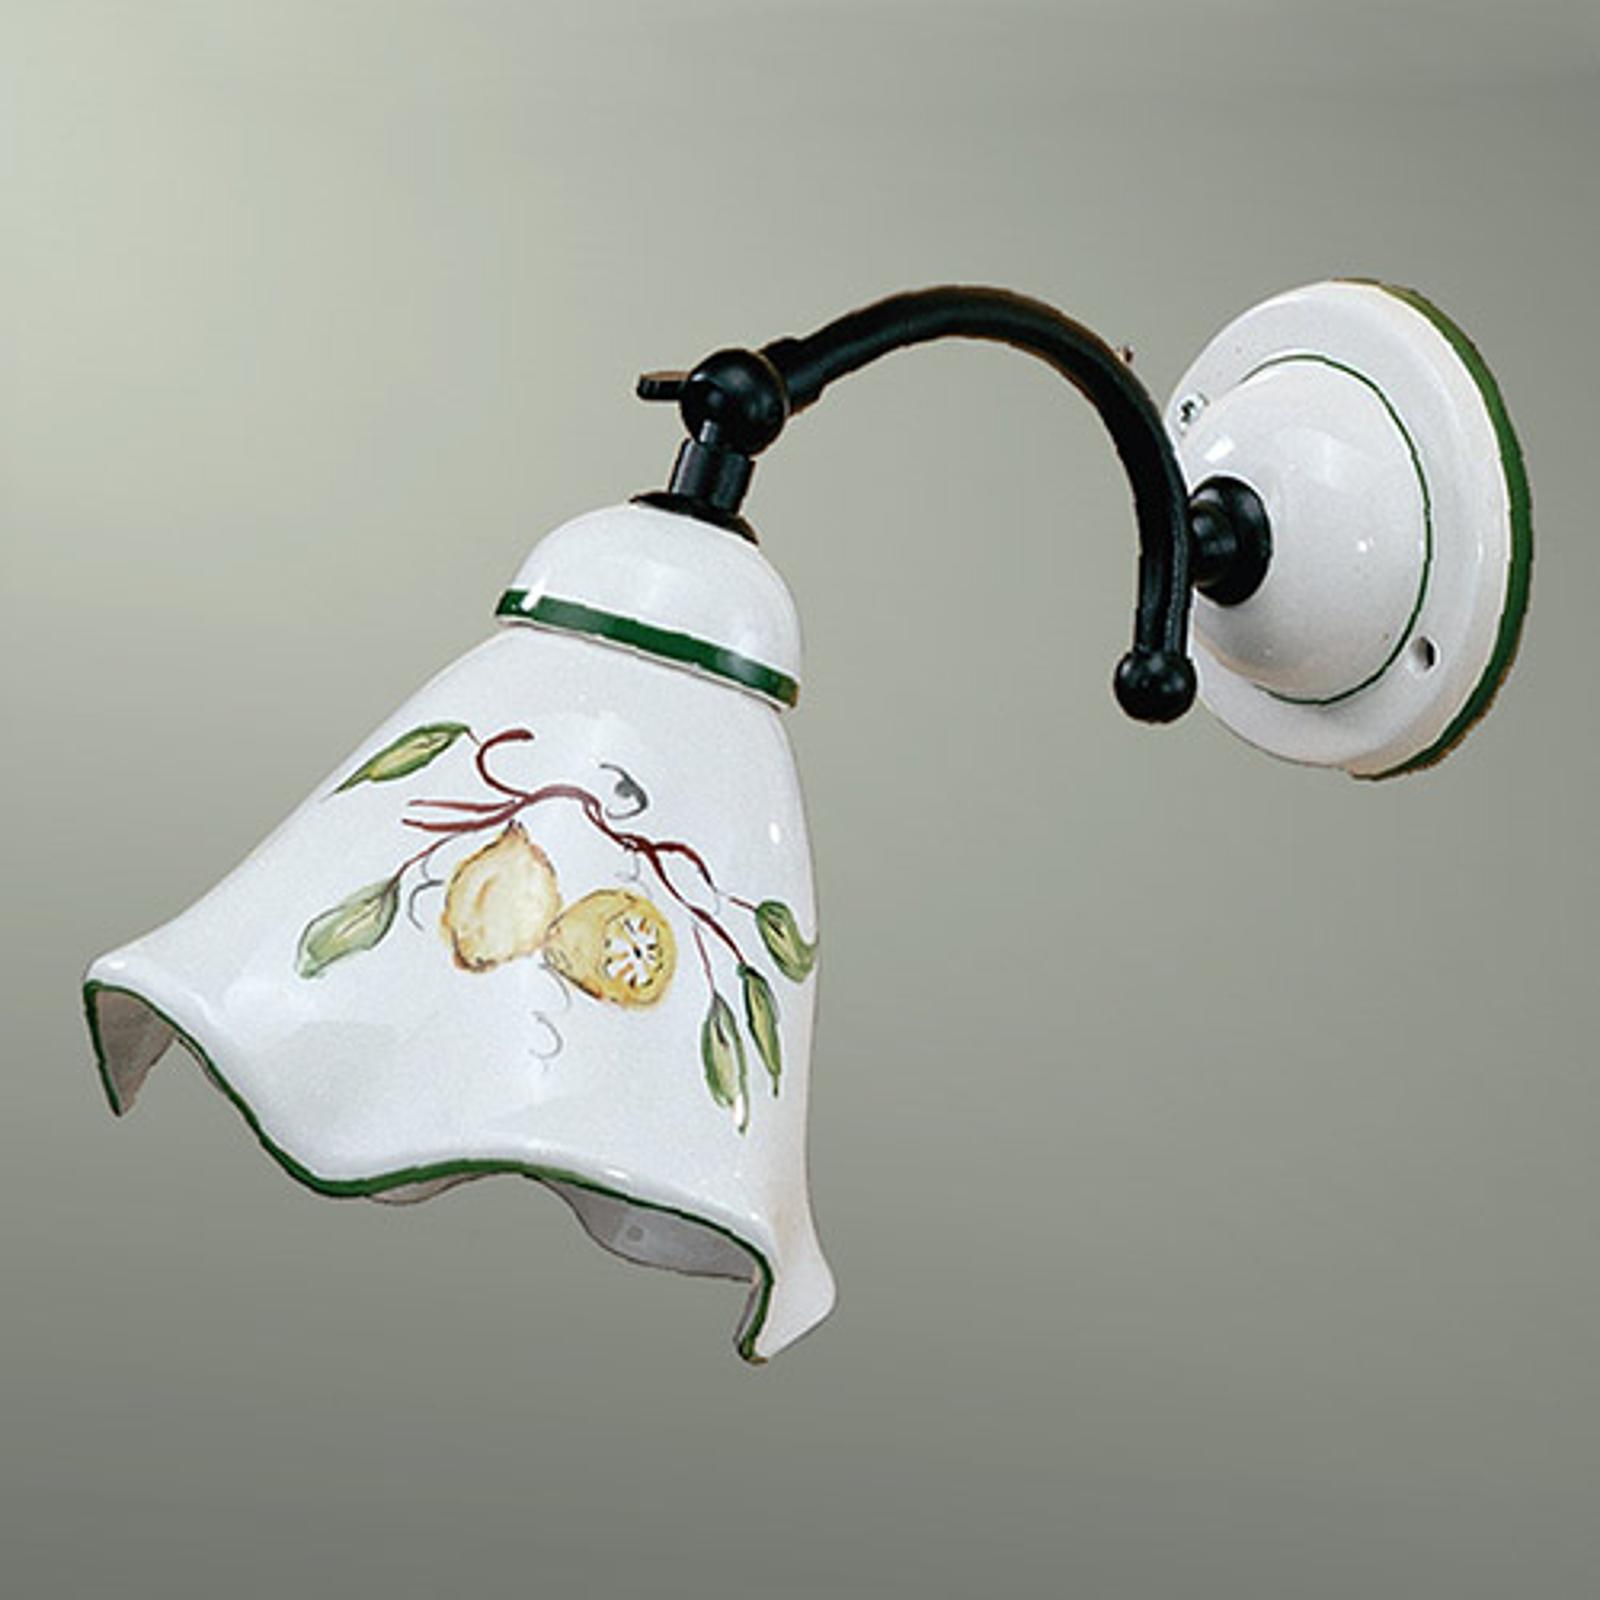 Aplique de cerámica Felicia con patrón de limón